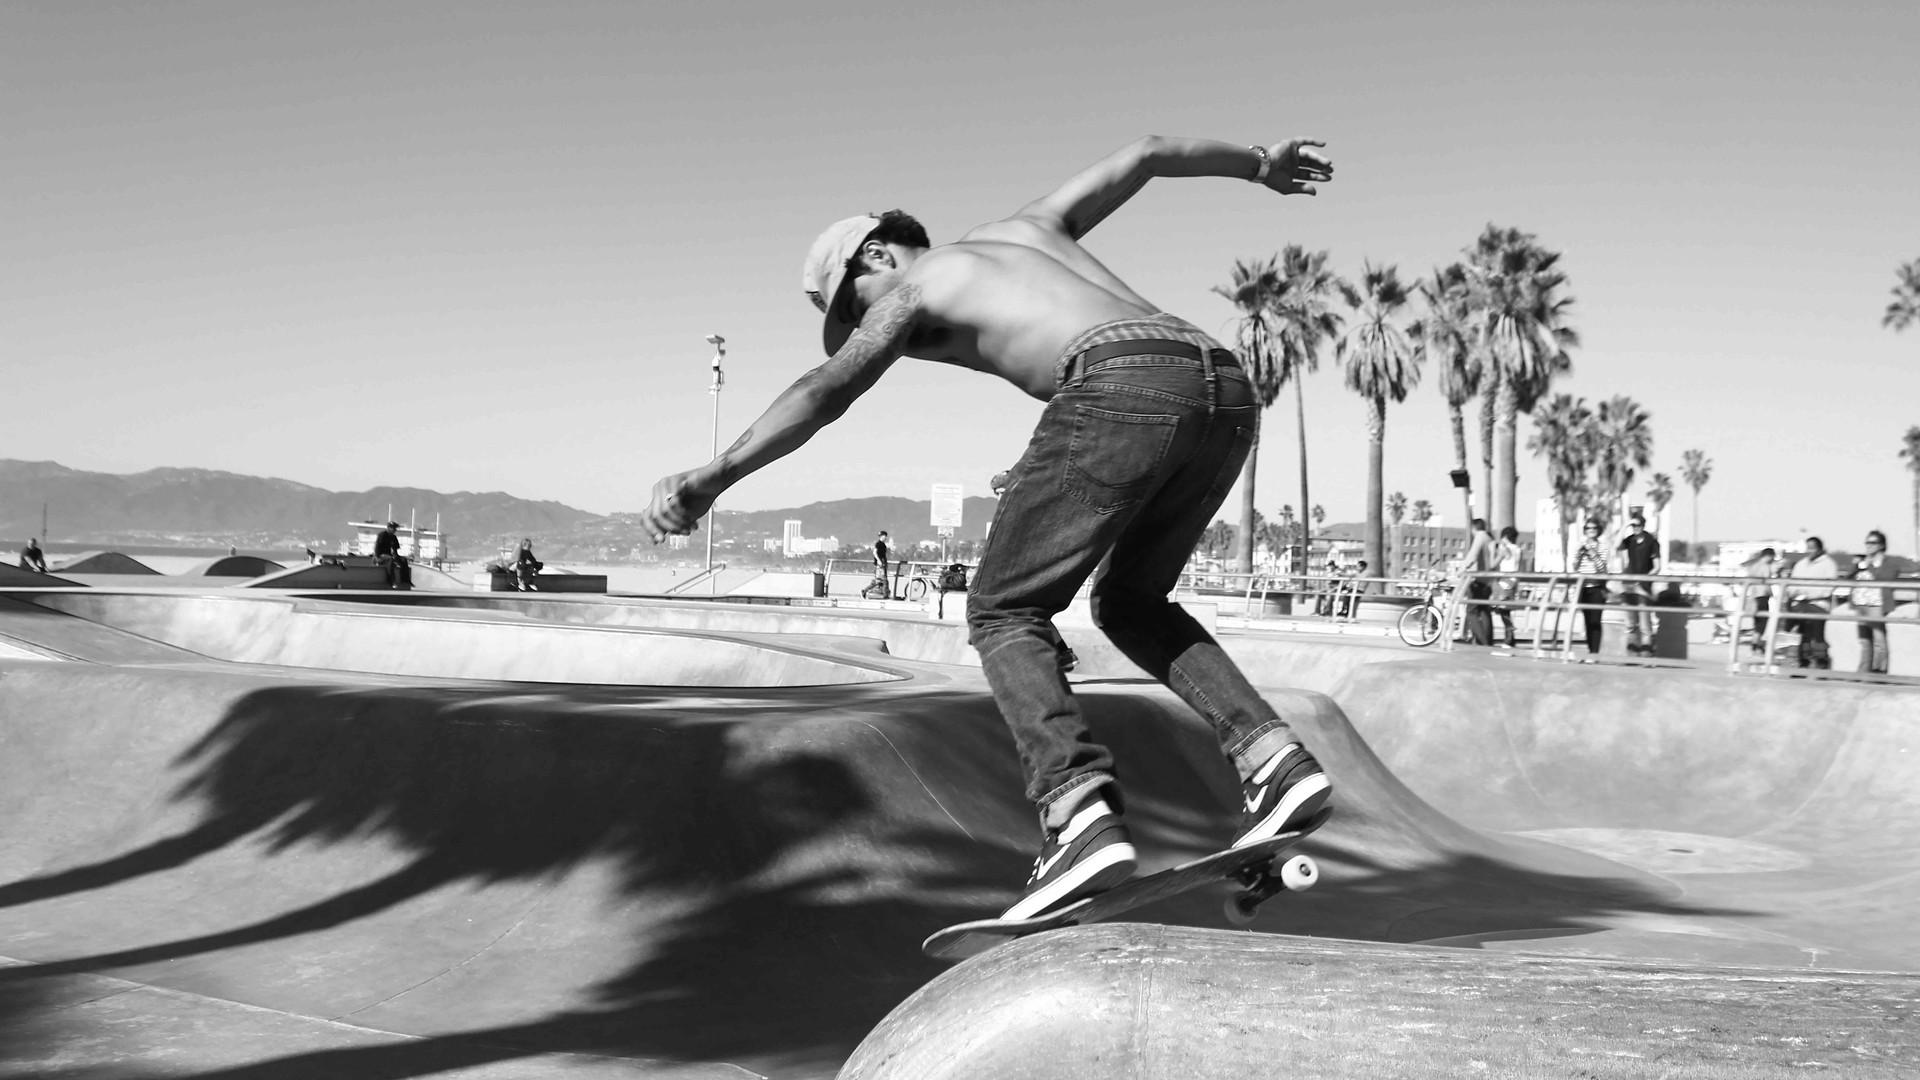 liene-geidane-skate_lowres.jpg